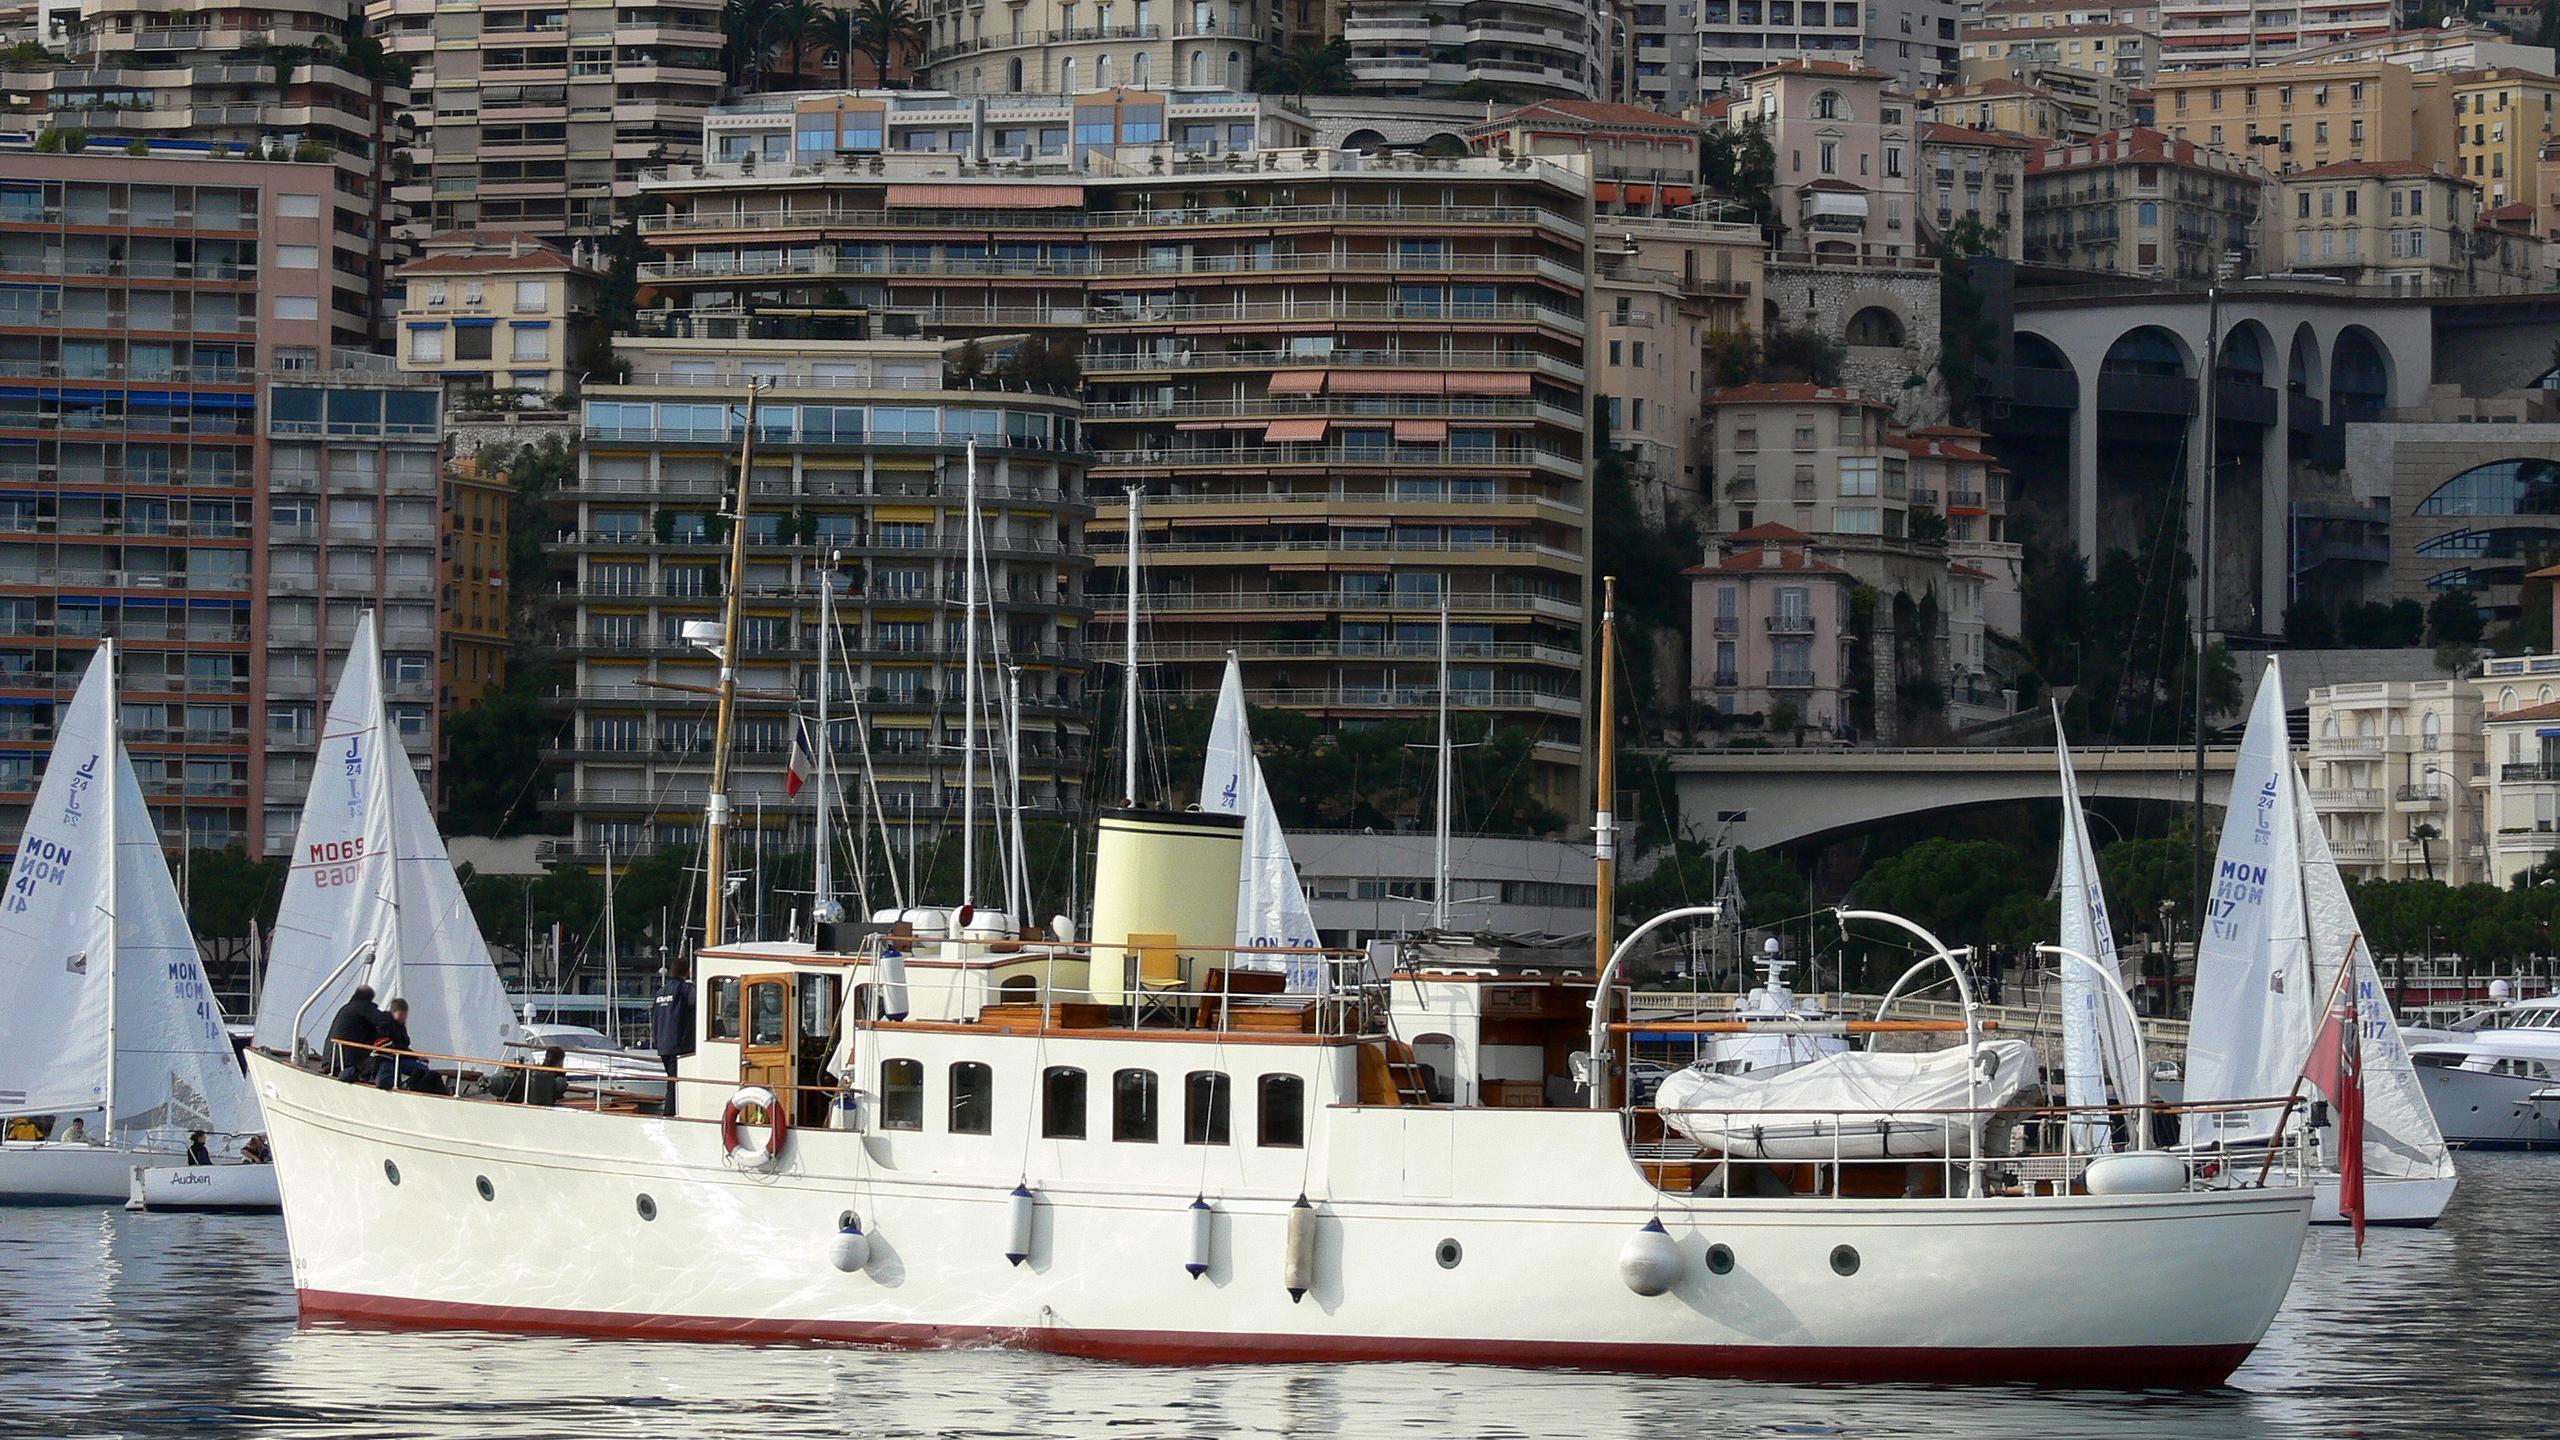 bystander-of-man-yacht-exterior